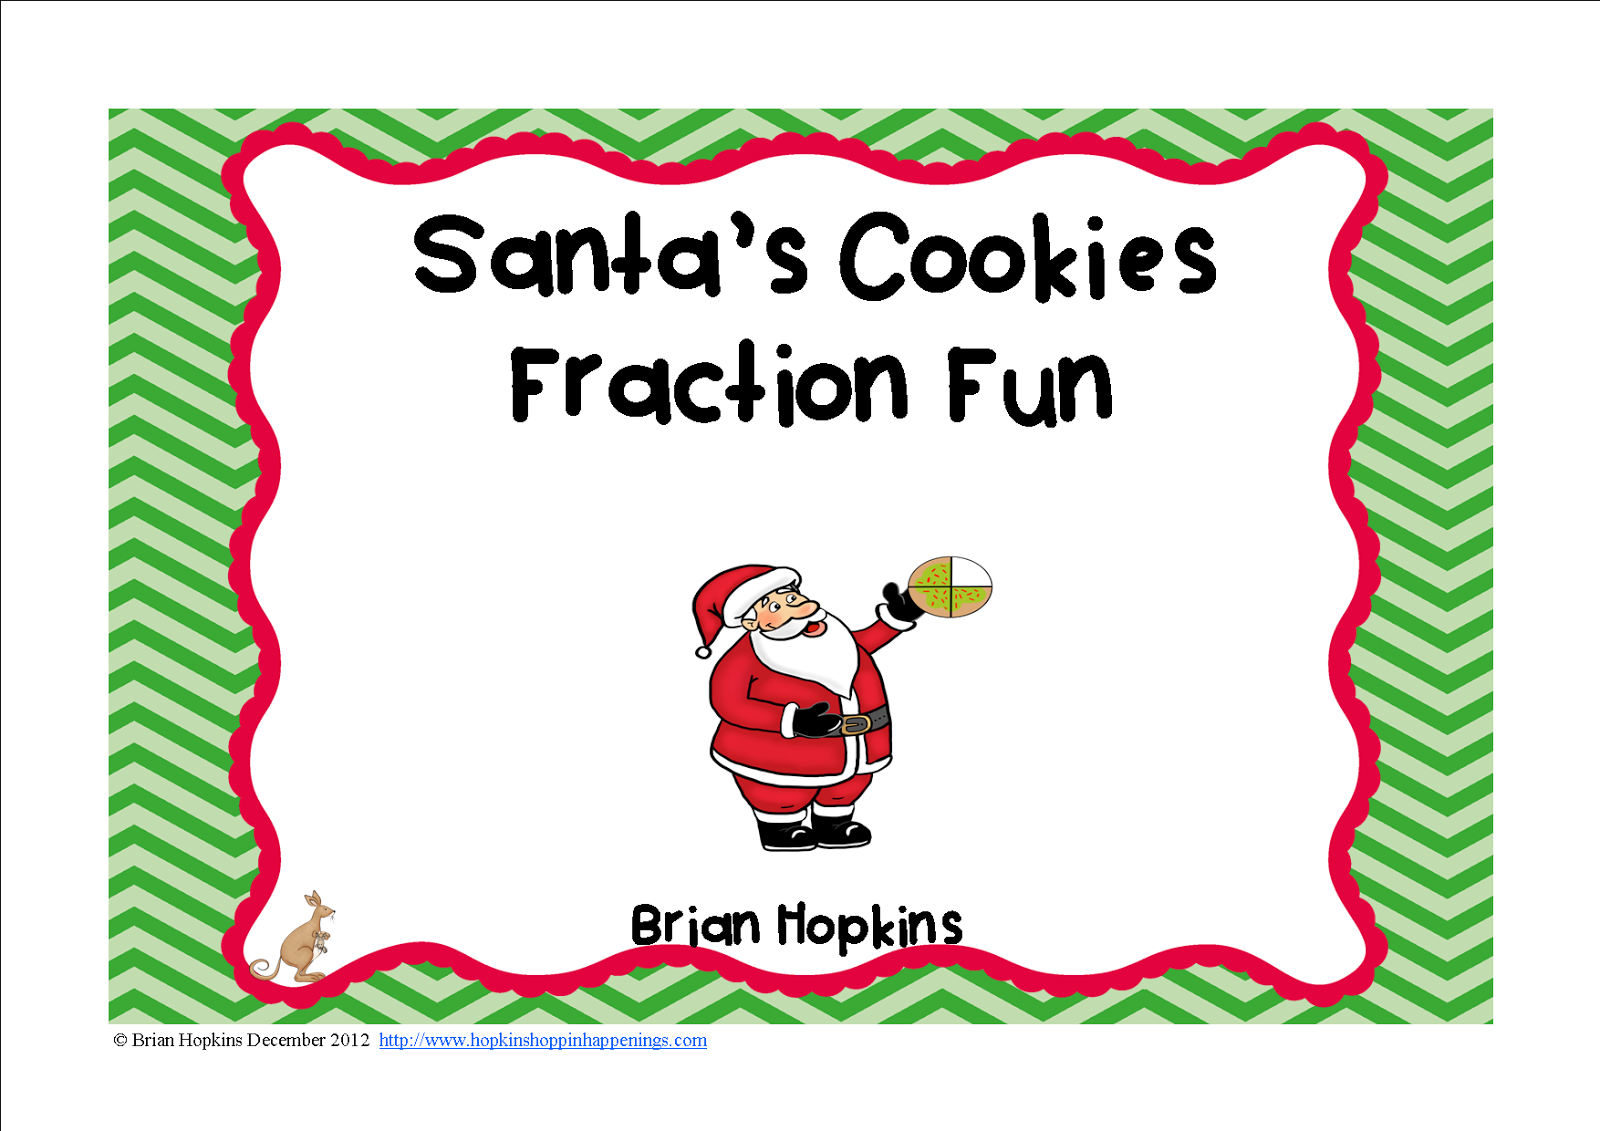 Santa's Cookies Fractions